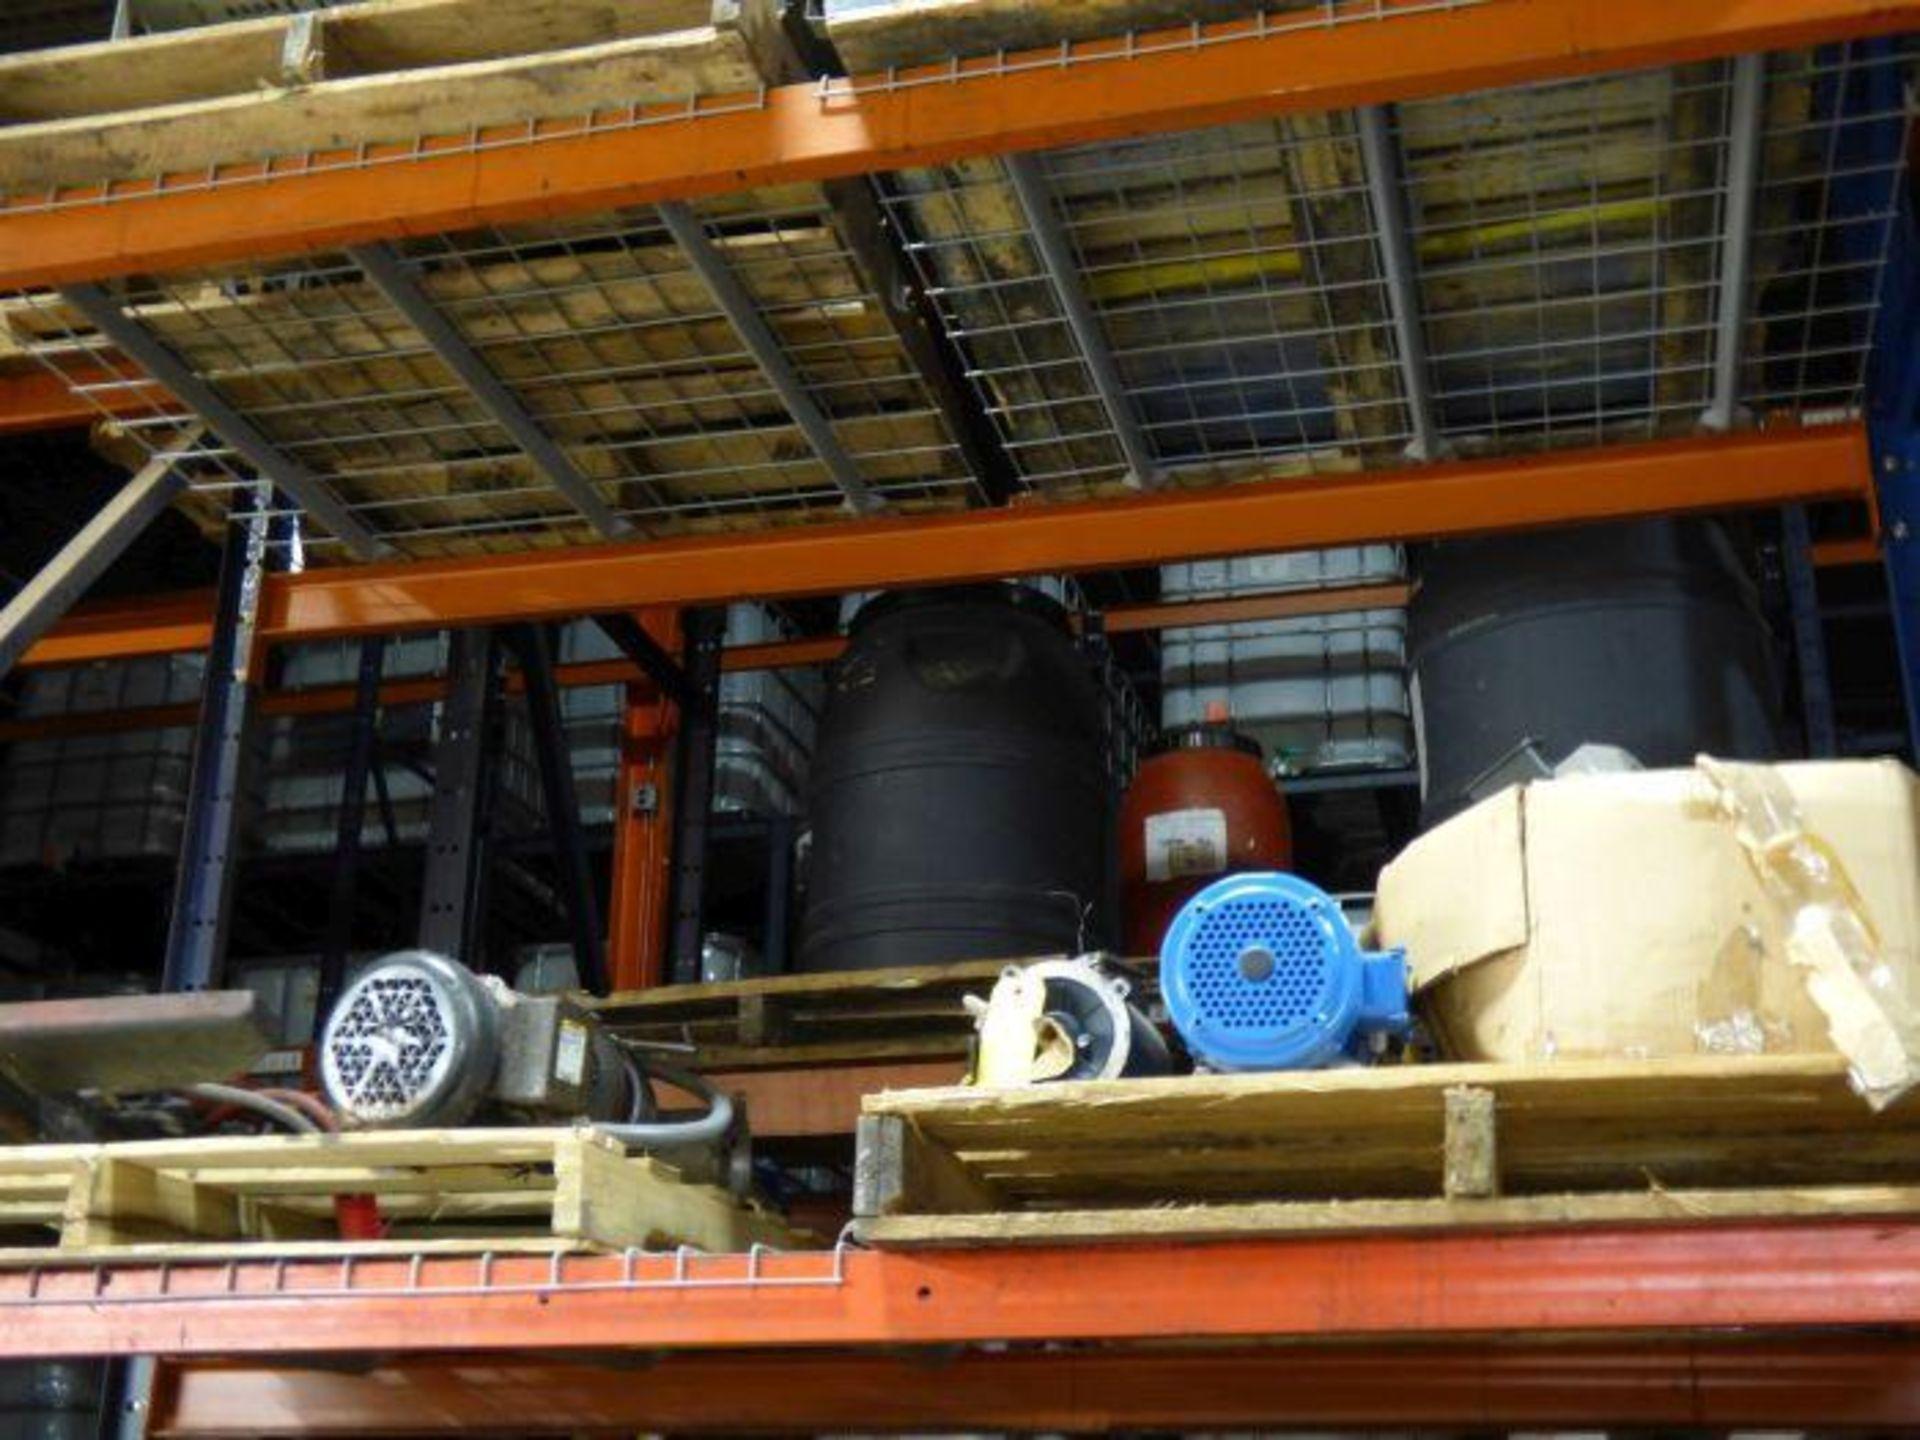 Lot 1142 - Lot Assorted Equipment